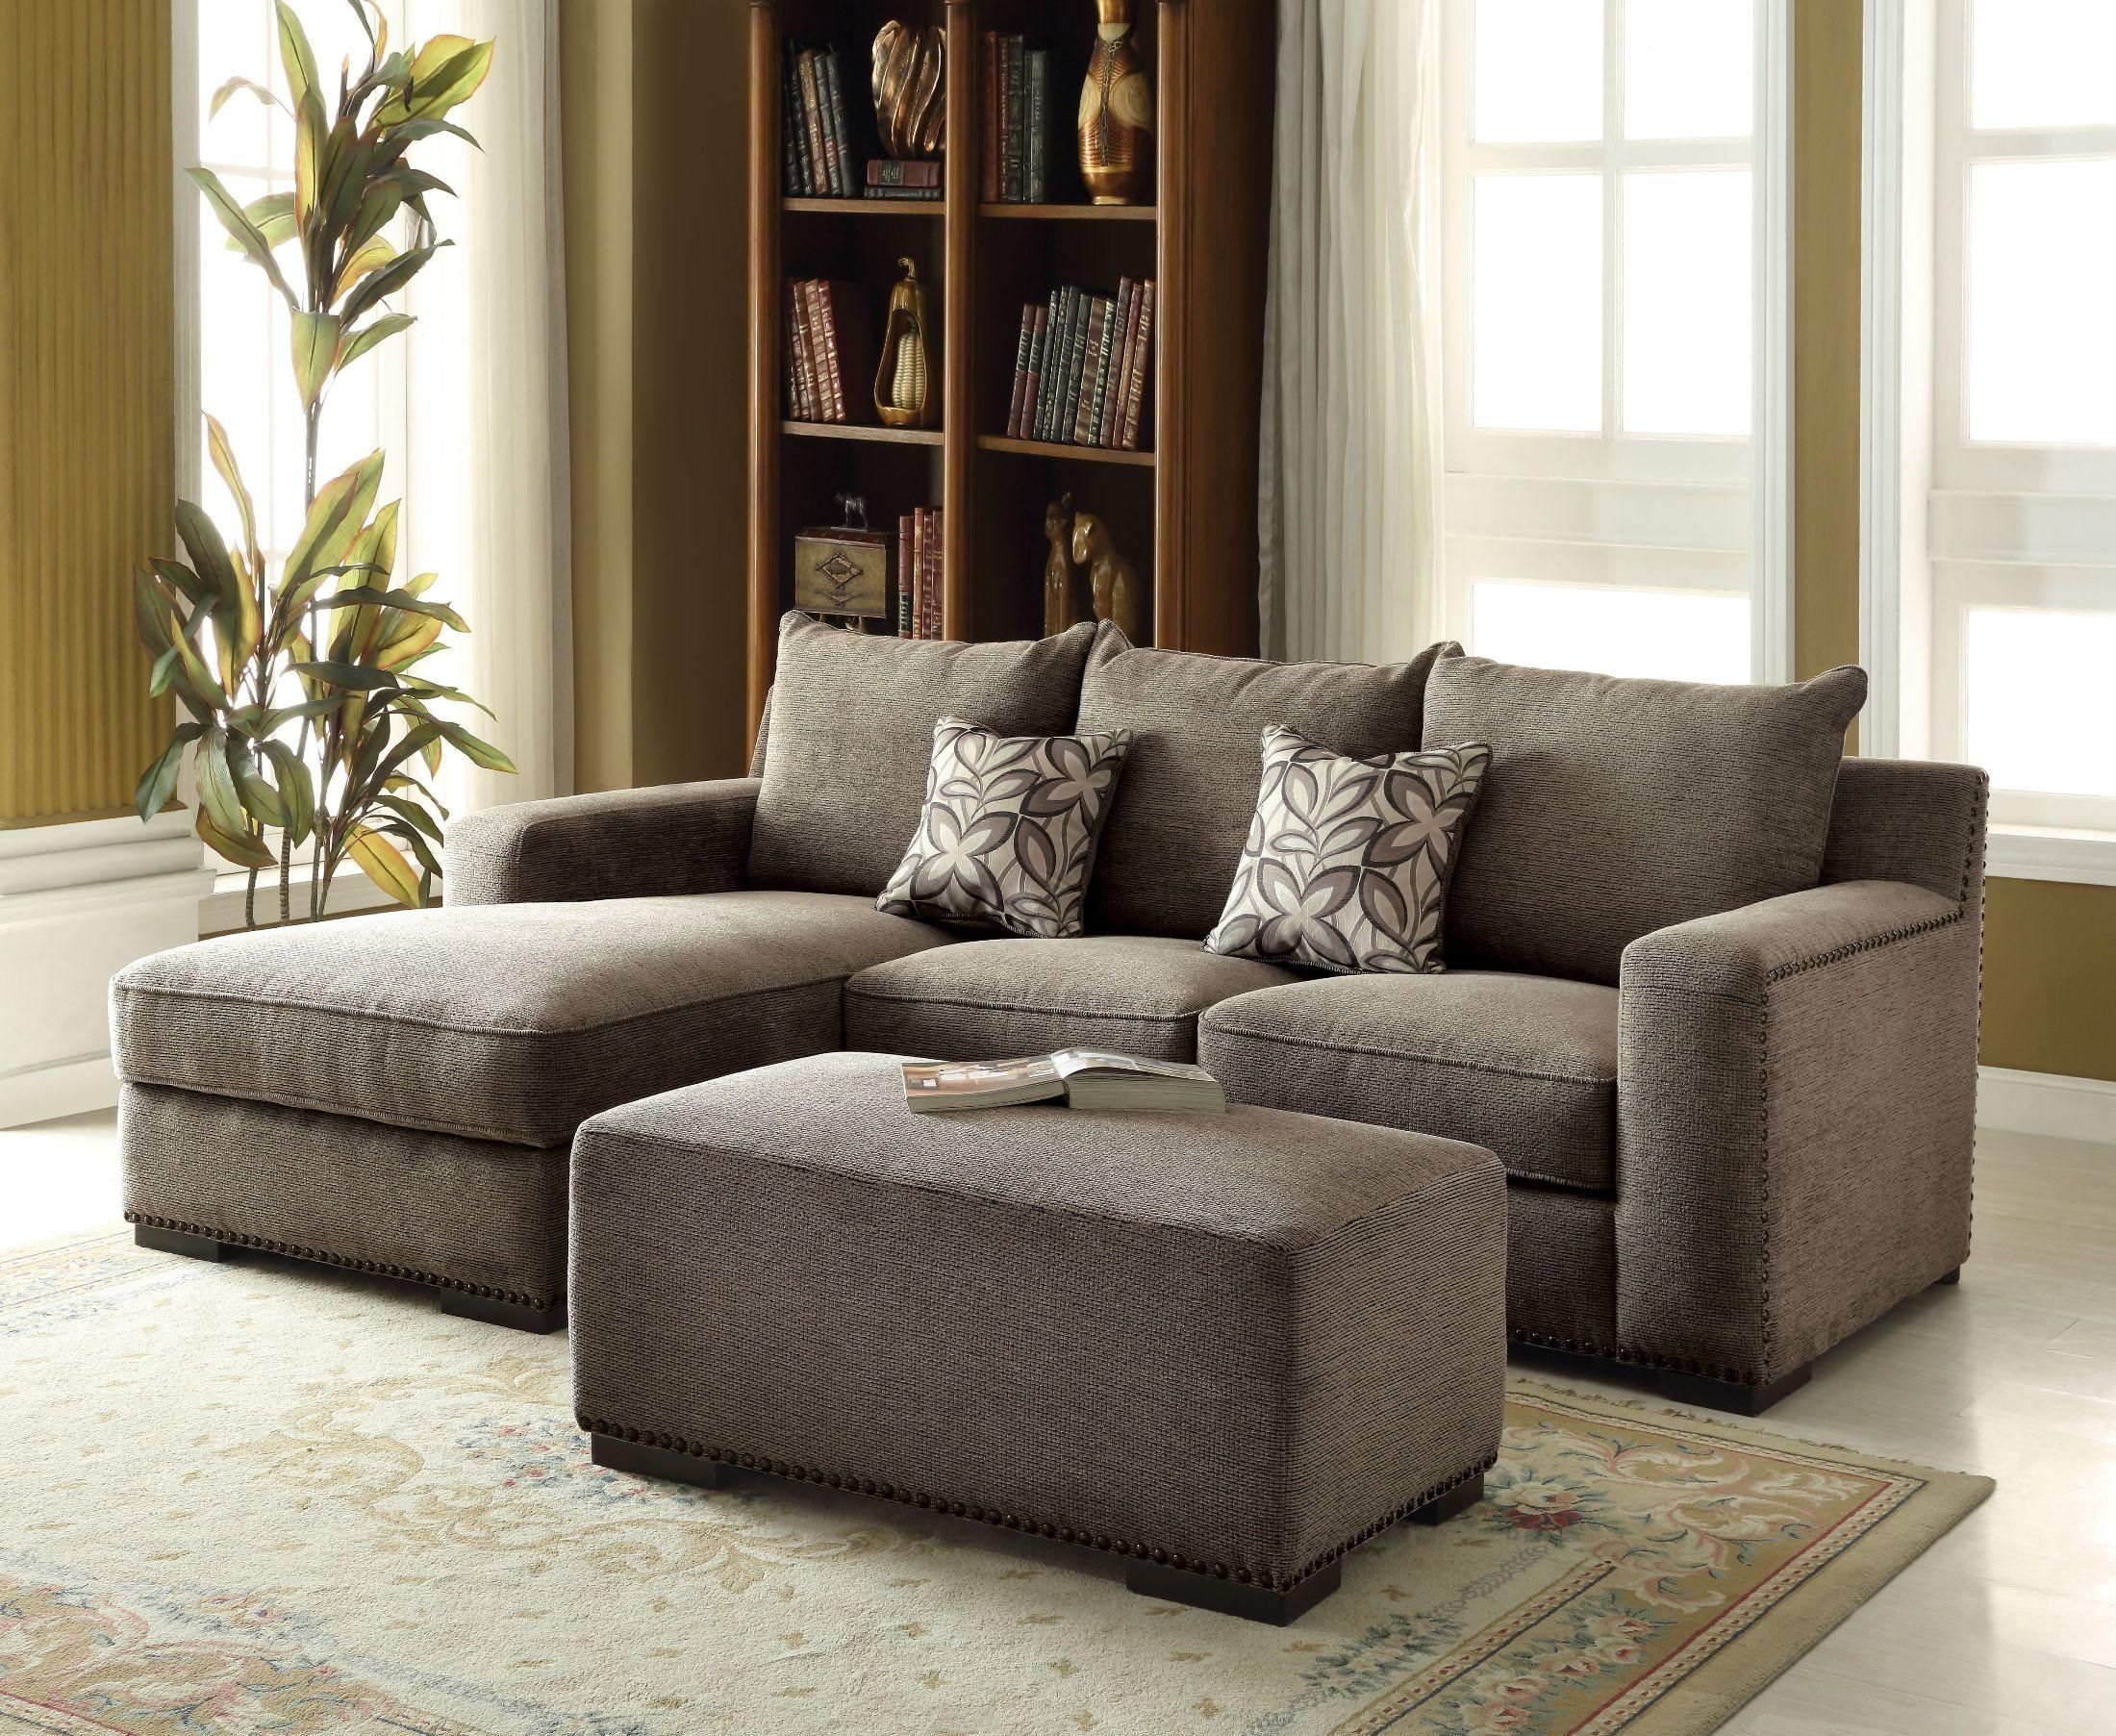 Ushury Gray Chenille Sectional Sofa 1stopbedrooms